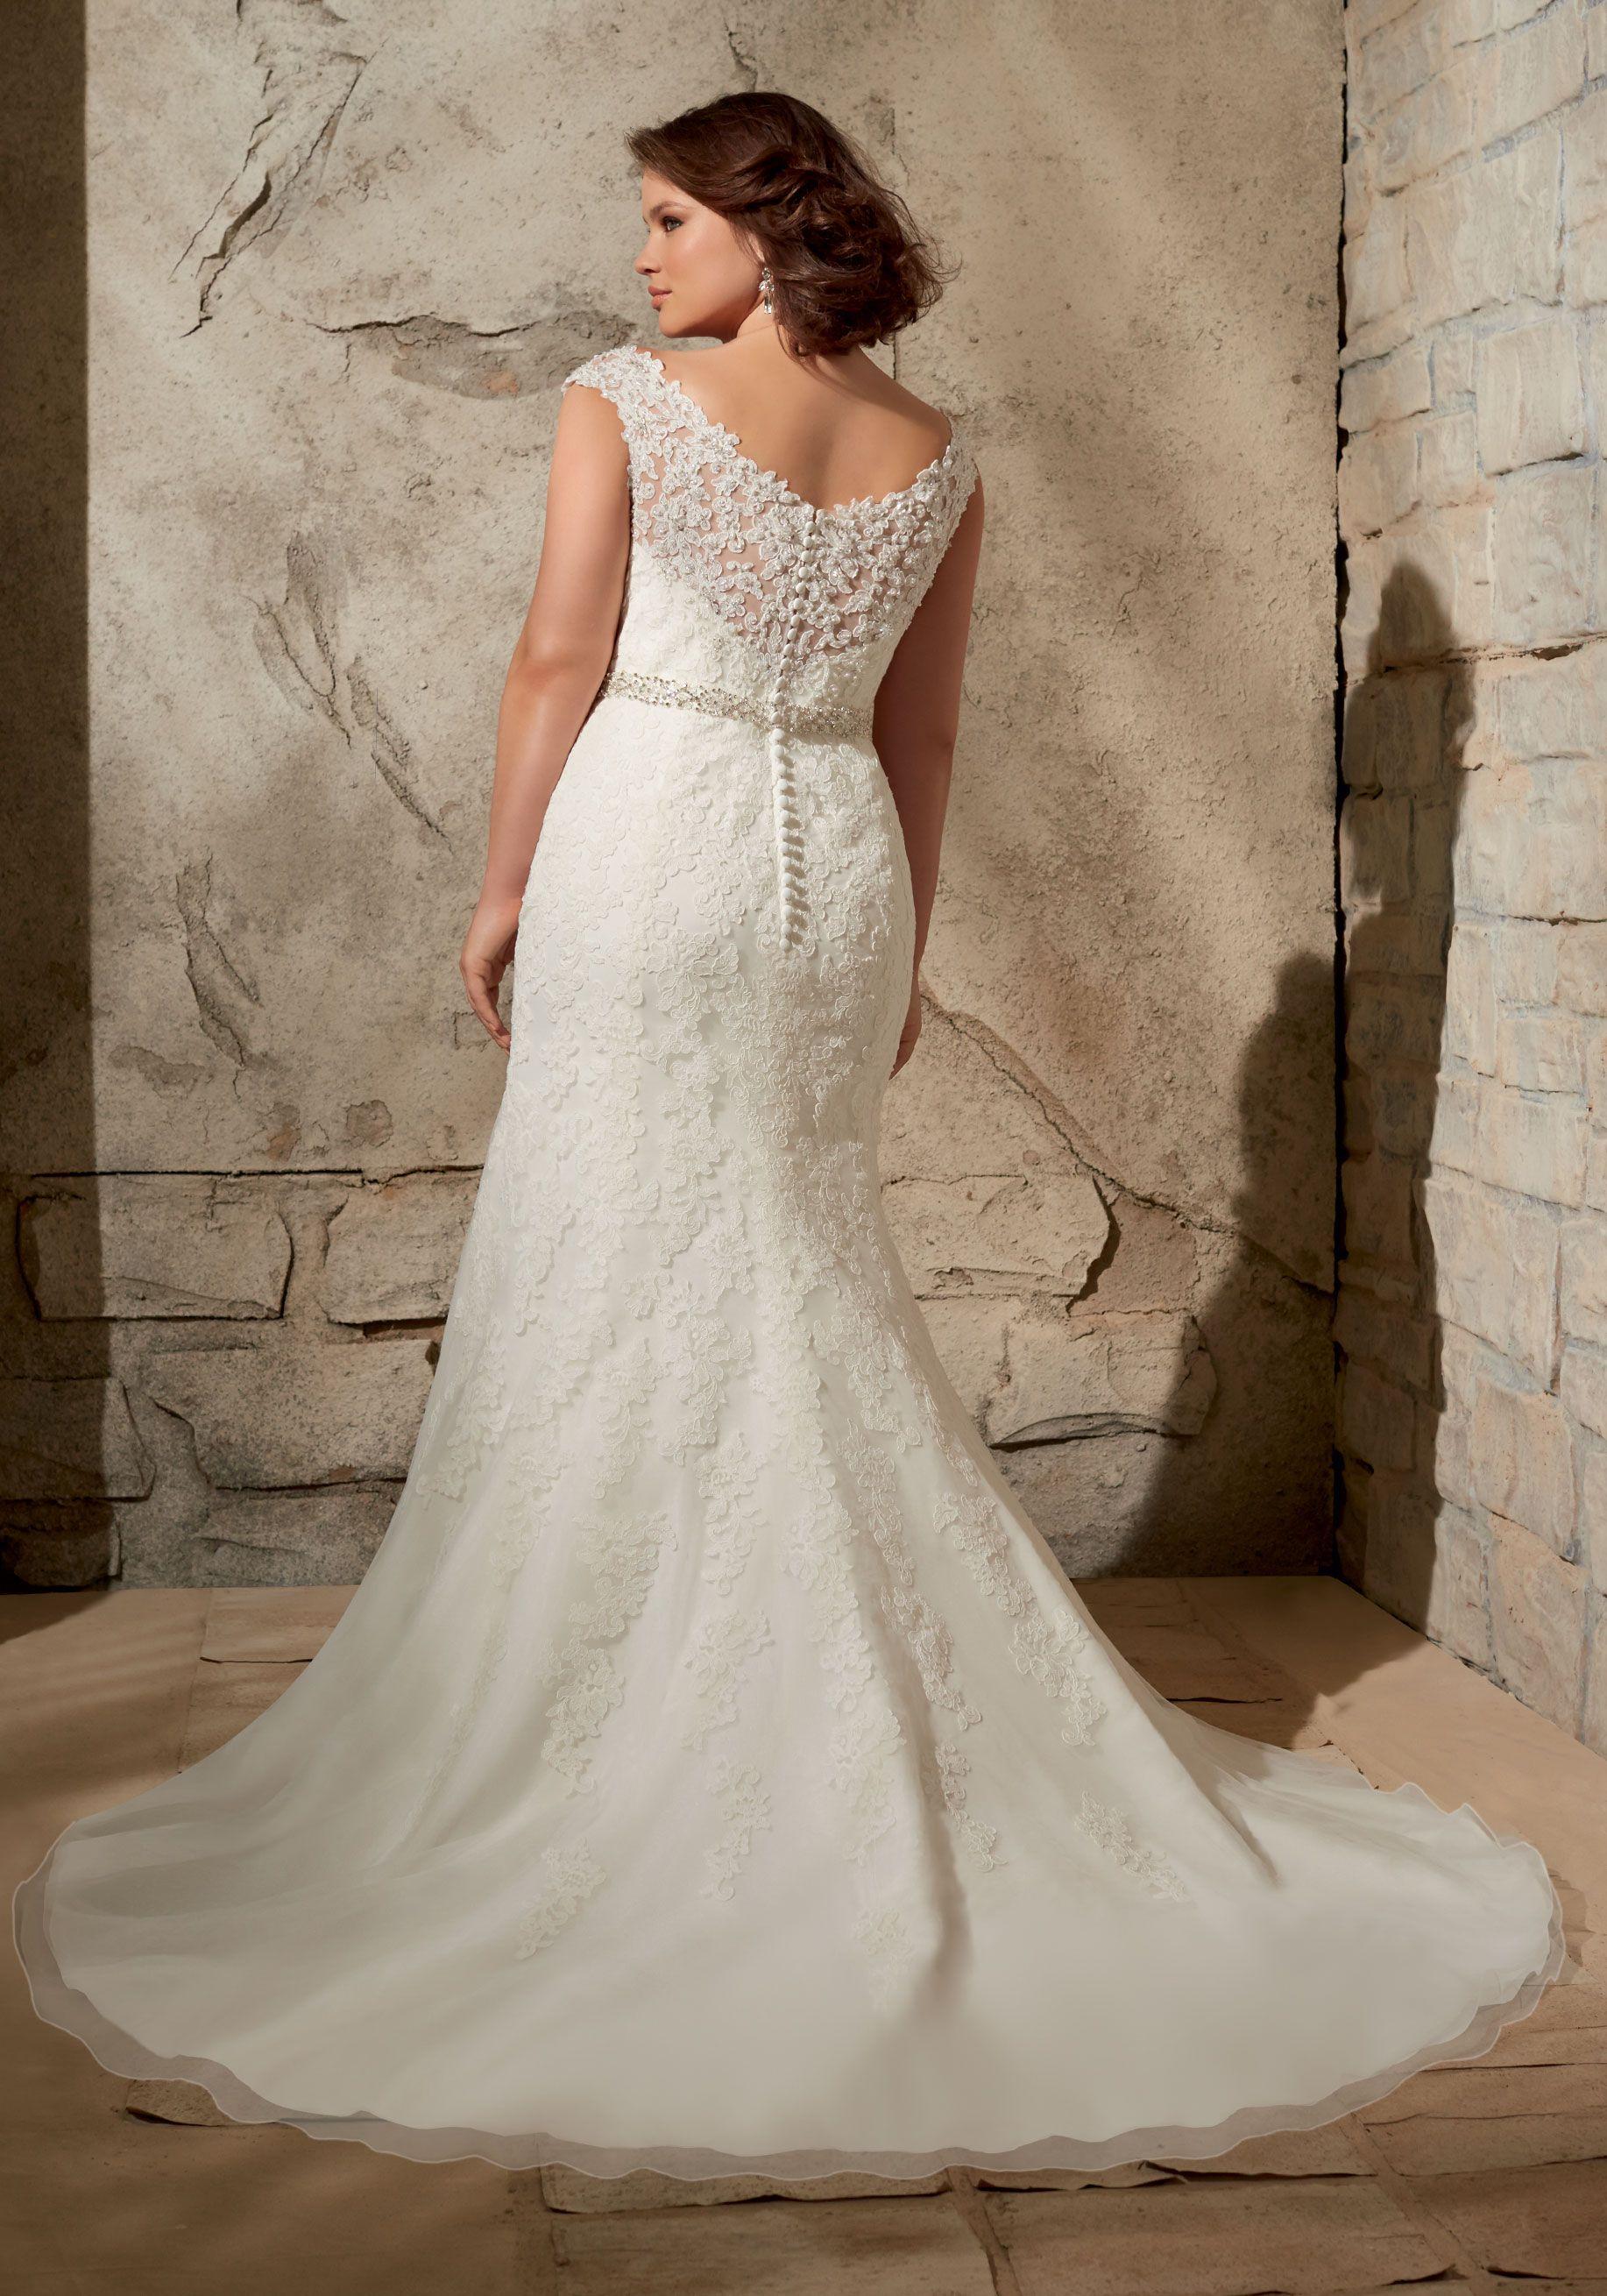 Alencon lace on net crystal beading plus size wedding dress colors alencon lace on net crystal beading plus size wedding dress colors available white junglespirit Gallery